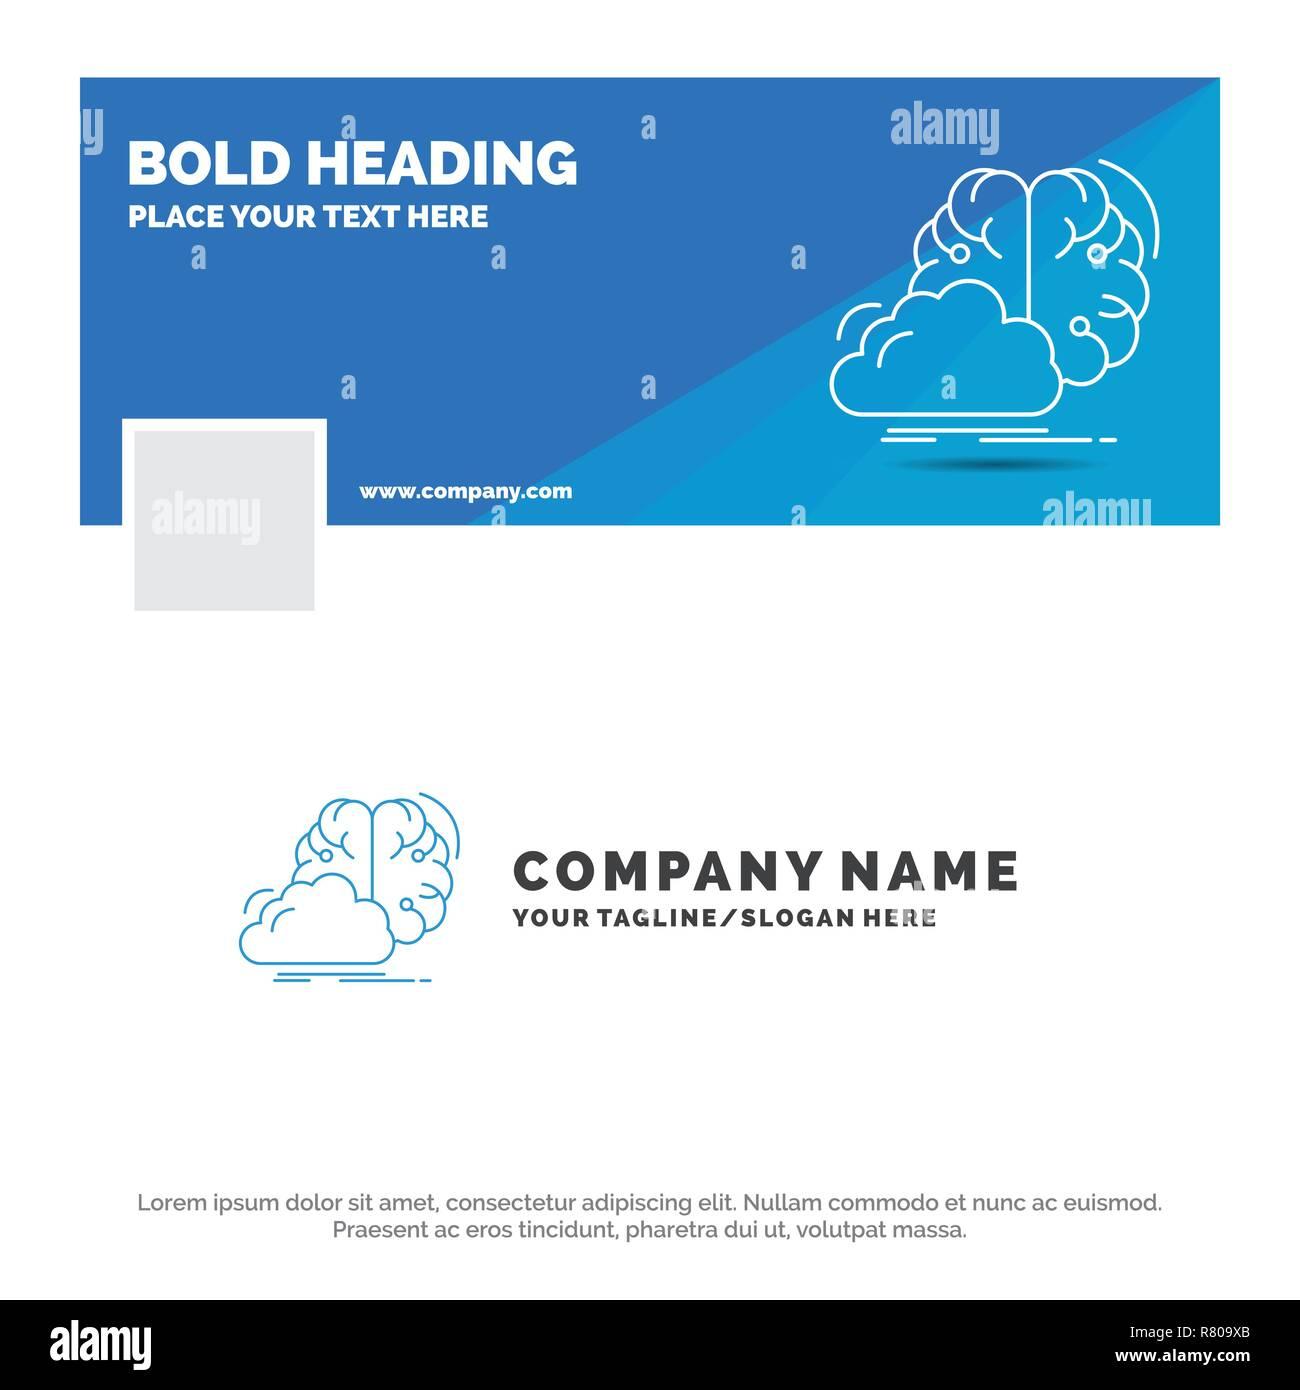 Blue Business Logo Template For Brainstorming Creative Idea Innovation Inspiration Facebook Timeline Banner Design Vector Web Banner Background Stock Vector Image Art Alamy